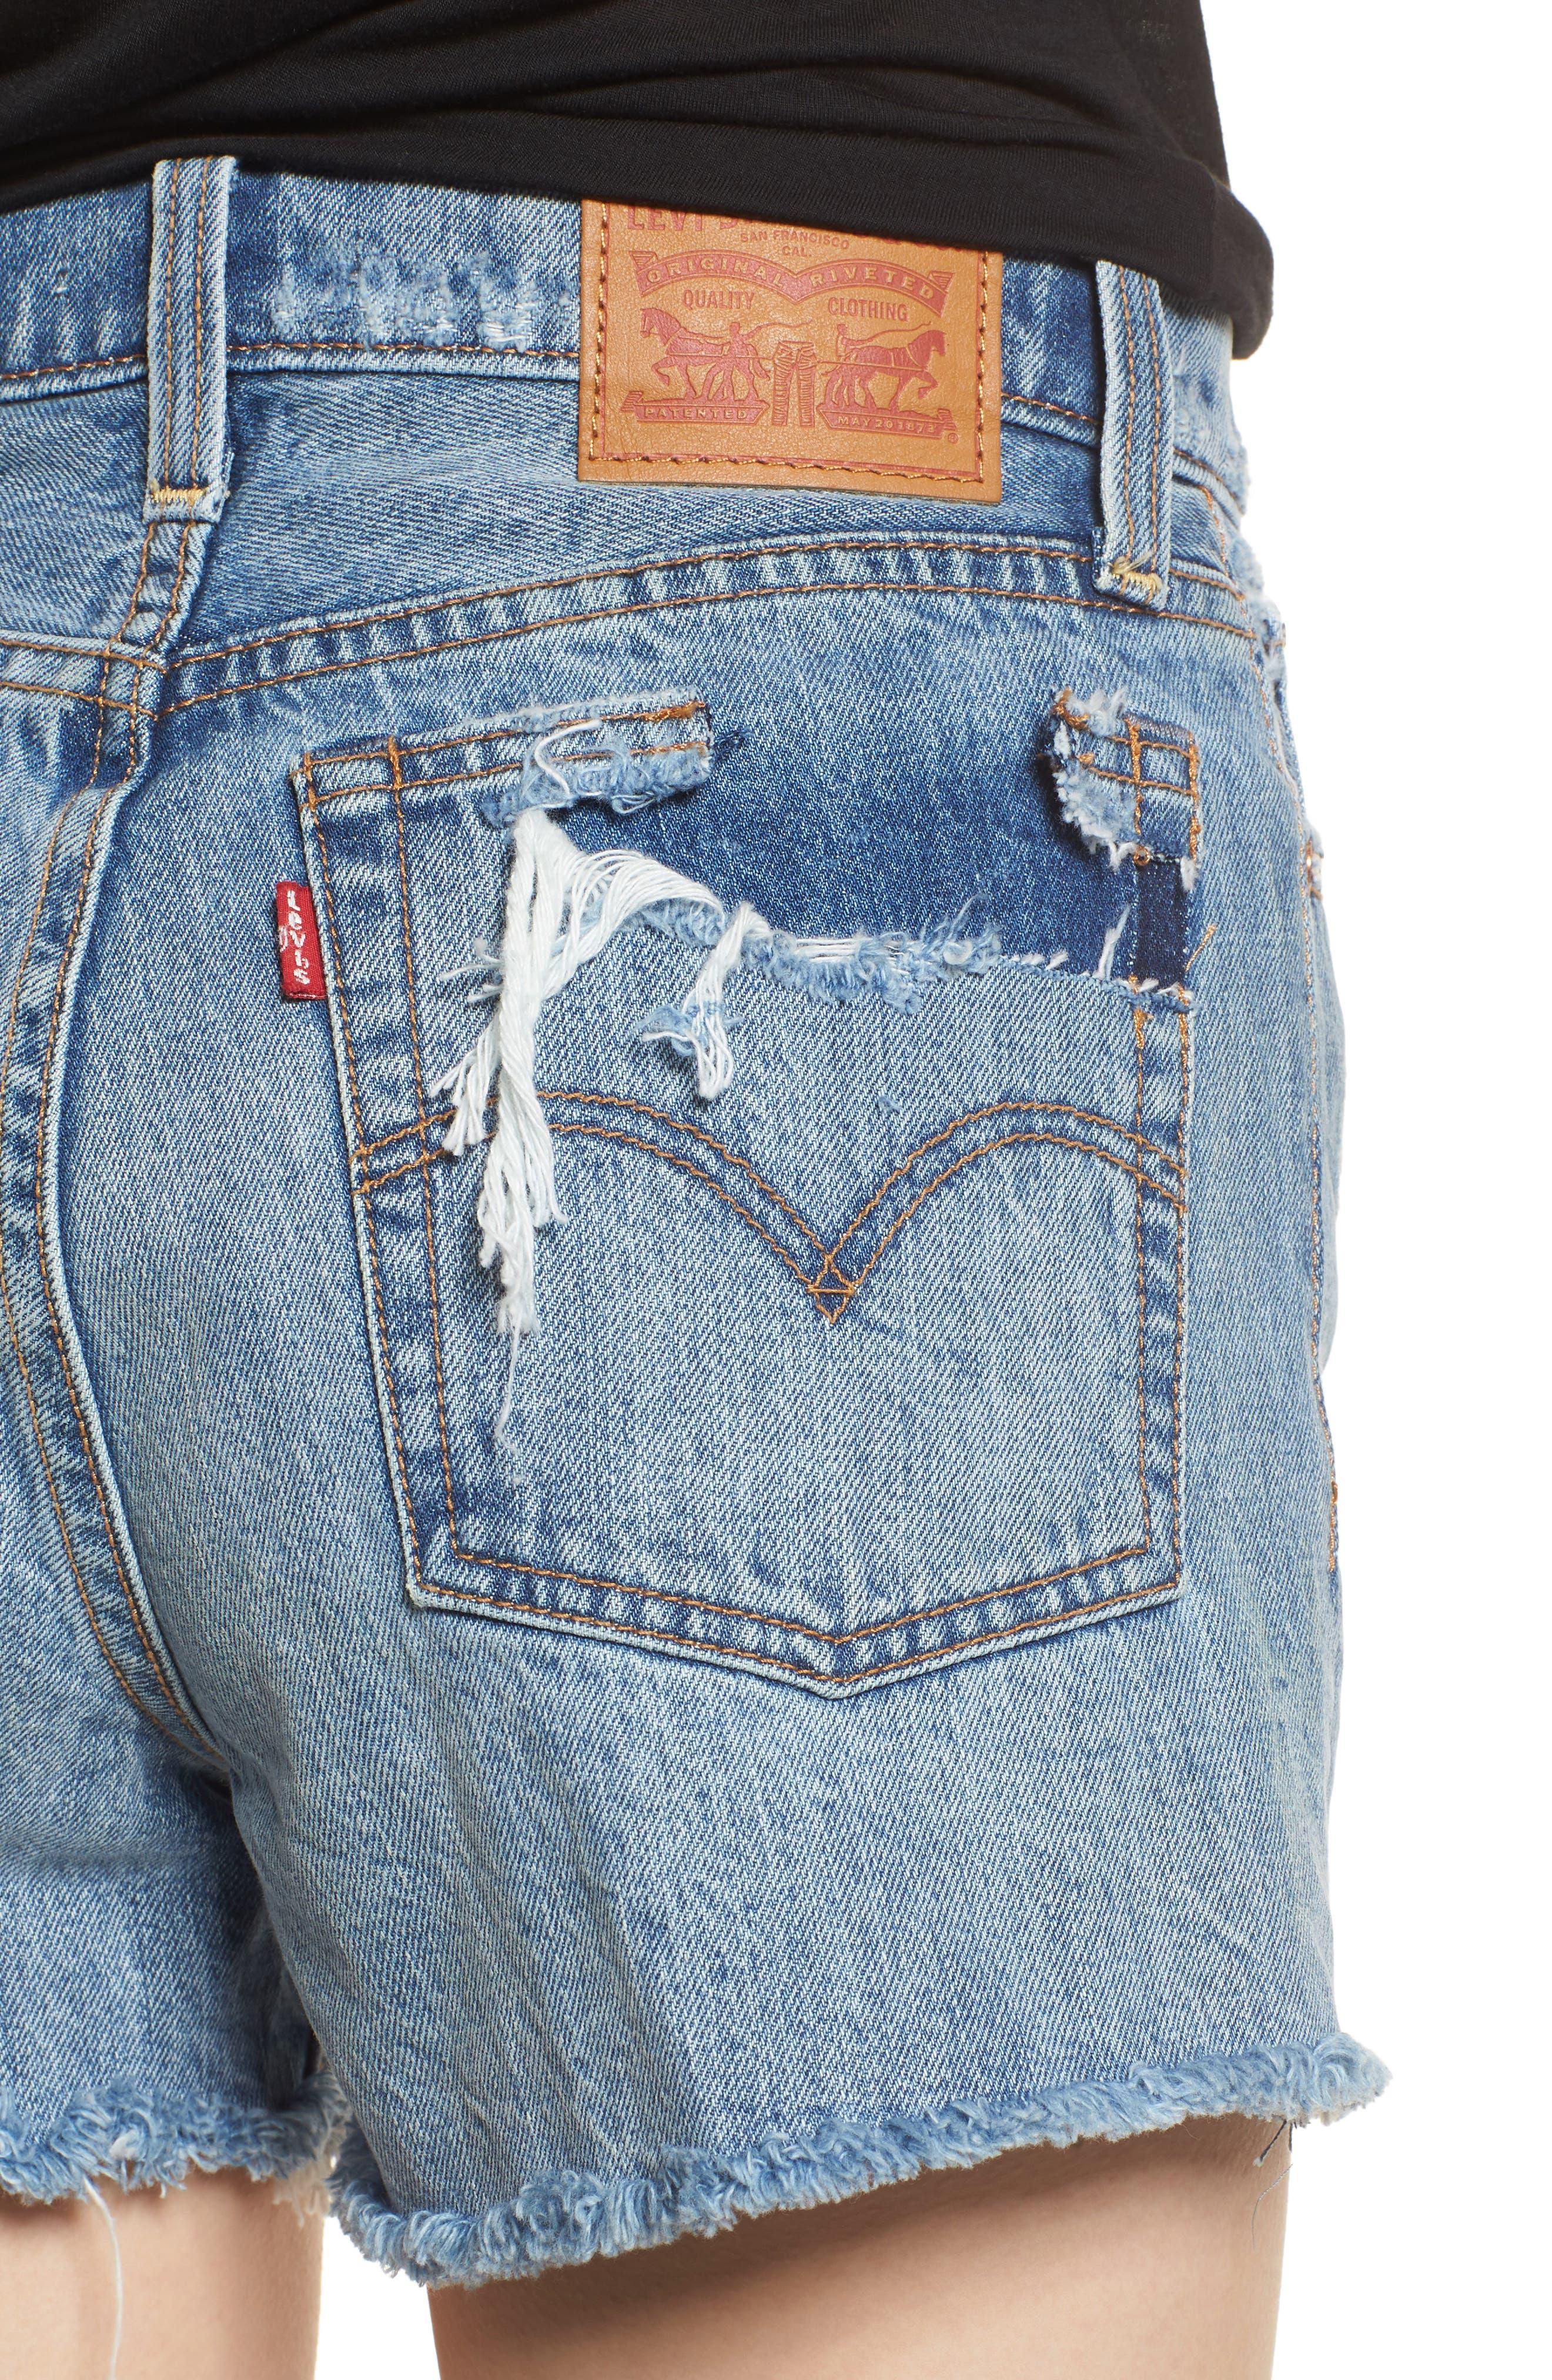 Wedgie High Waist Cutoff Denim Shorts,                             Alternate thumbnail 4, color,                             401